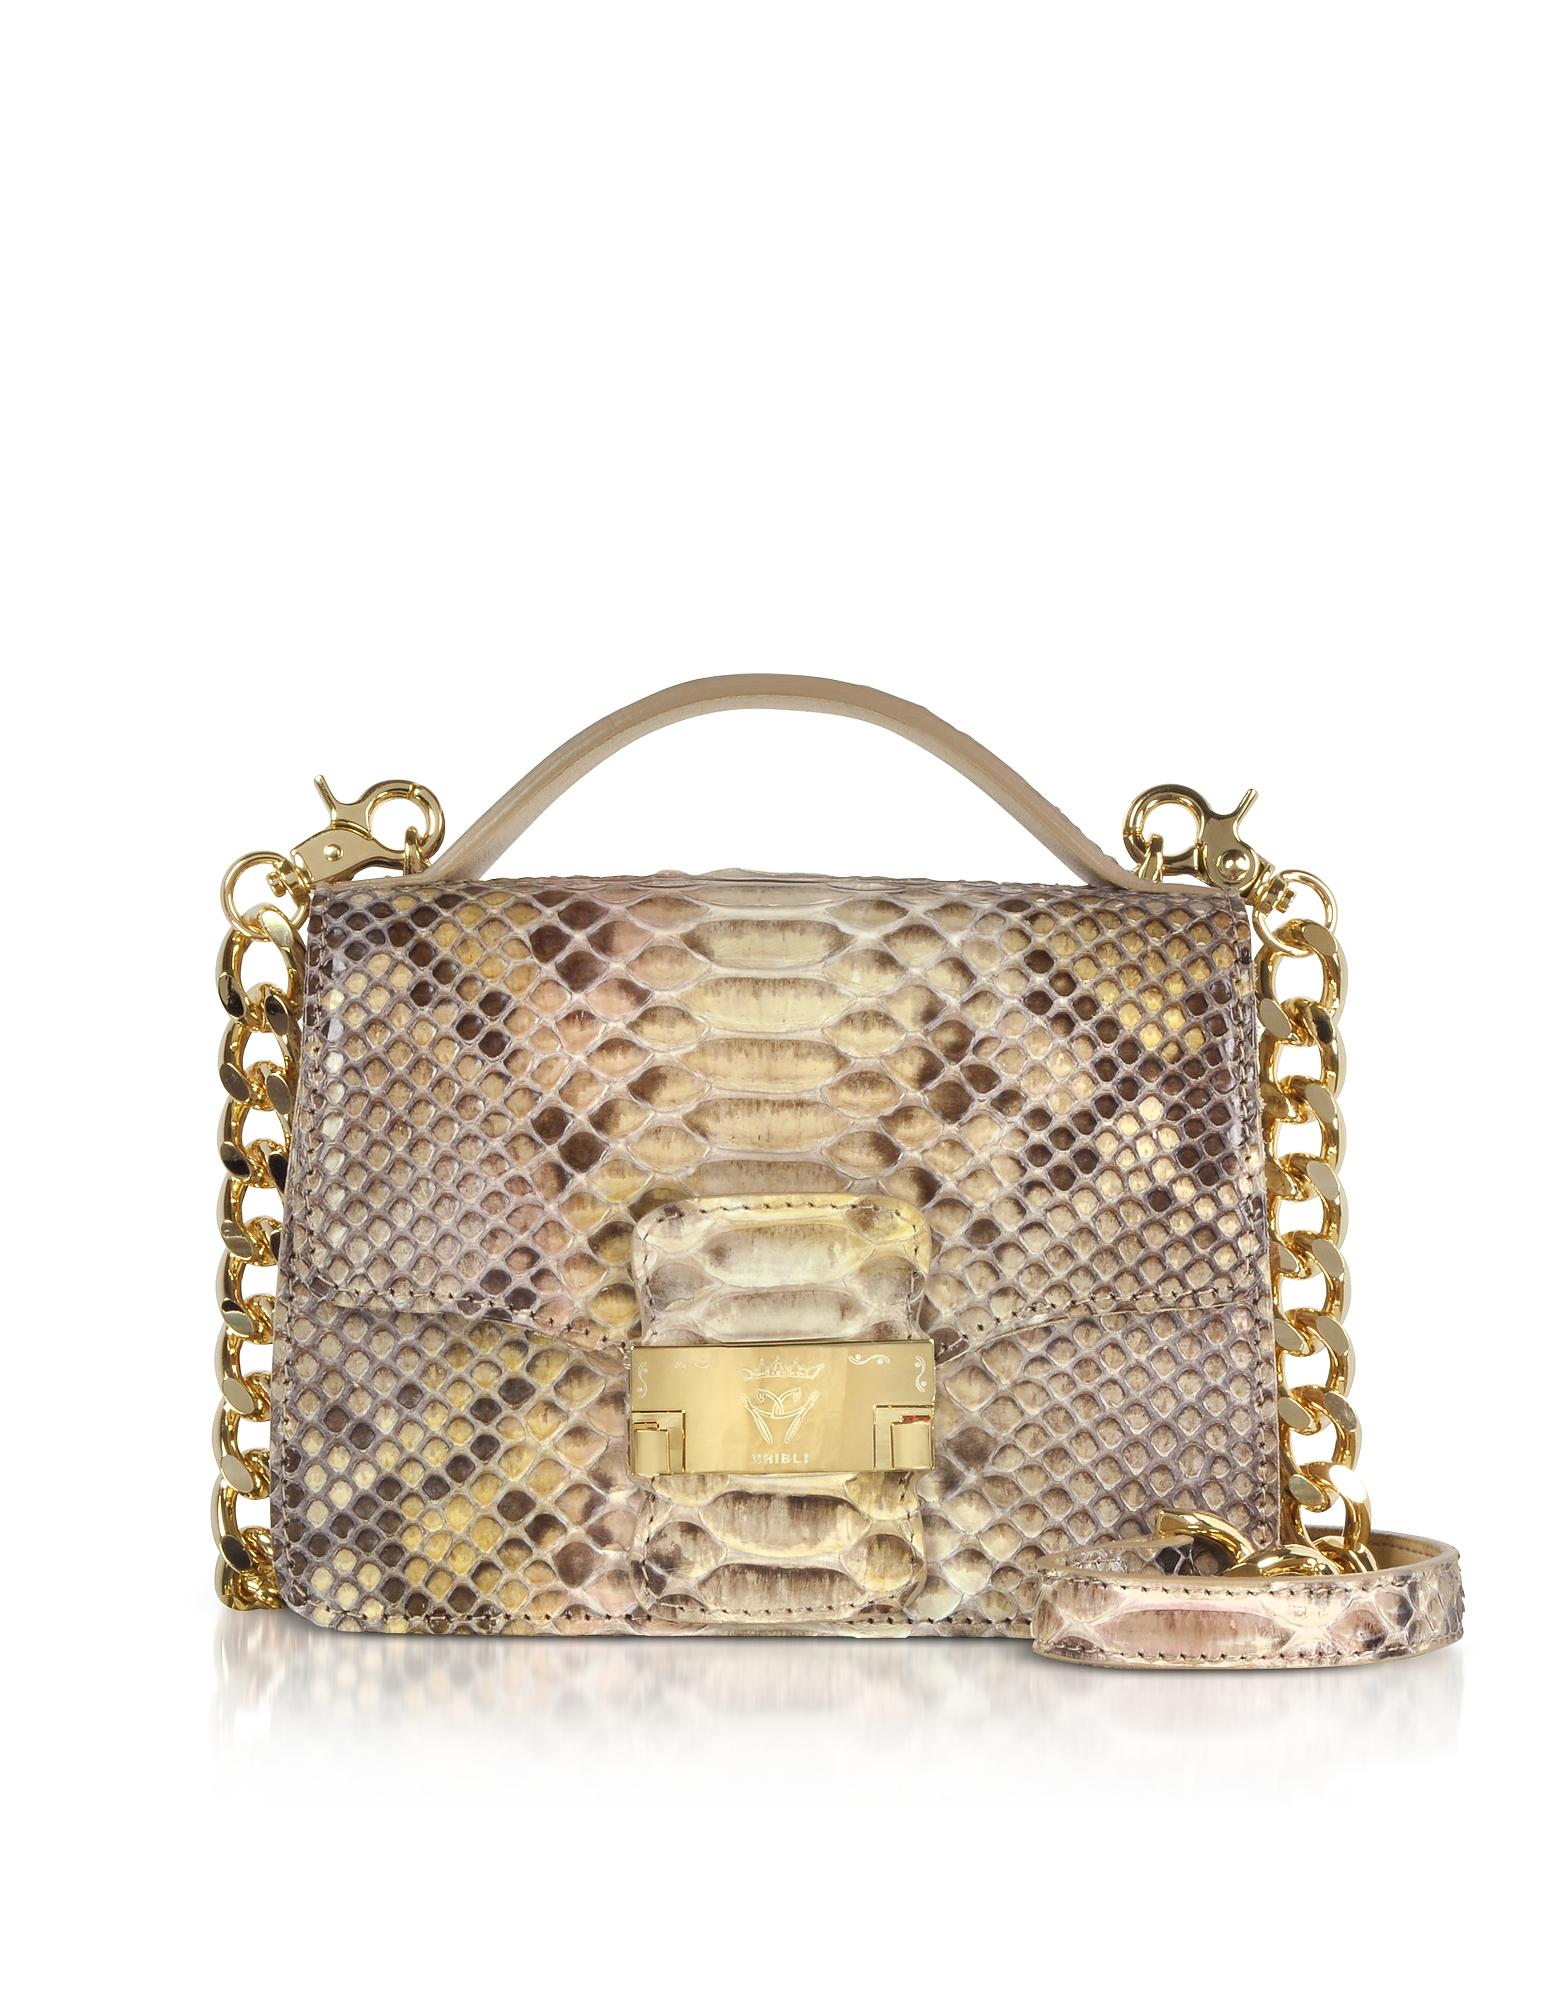 Image of Ghibli Designer Handbags, Python Leather Crossbody Bag